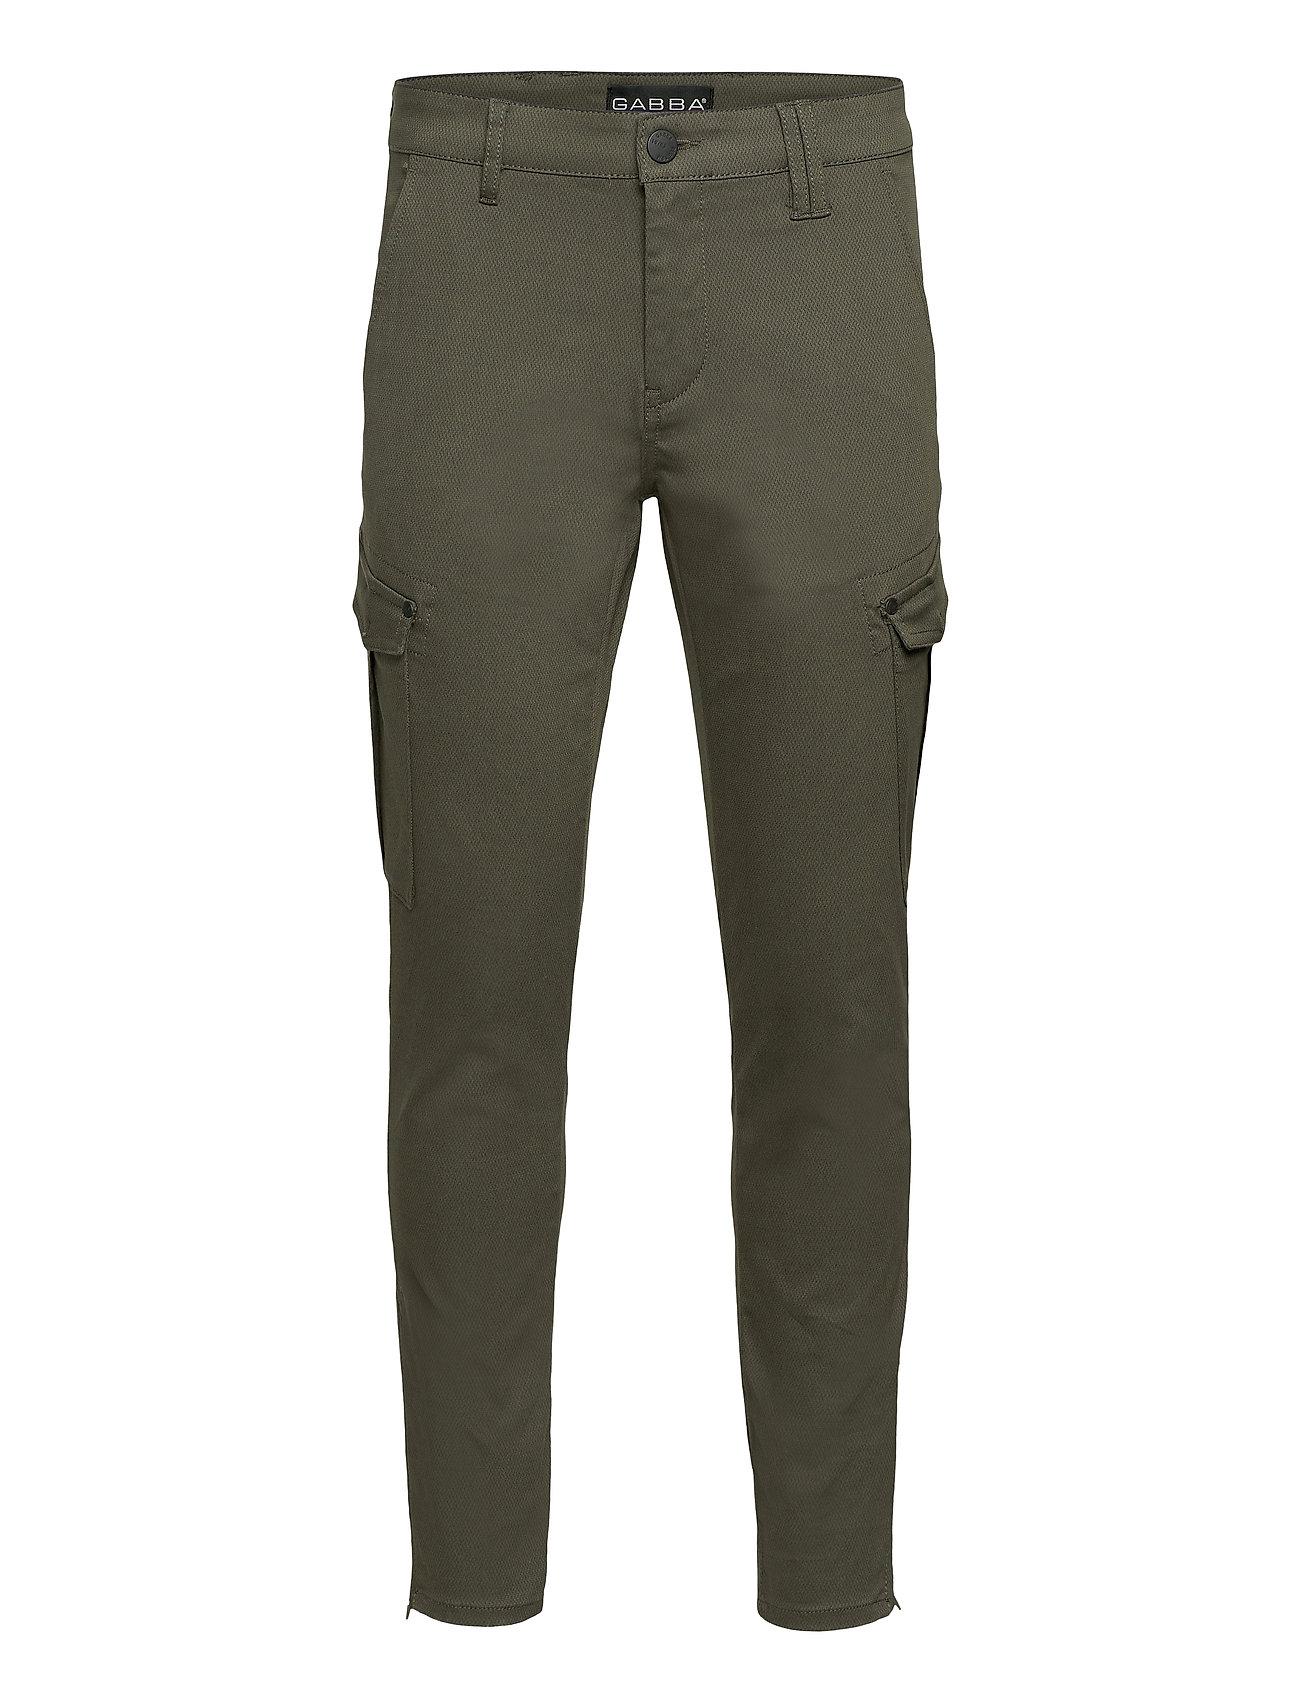 Image of Pisa Cargo K3280 Dale Pant Trousers Cargo Pants Grøn Gabba (3494837949)